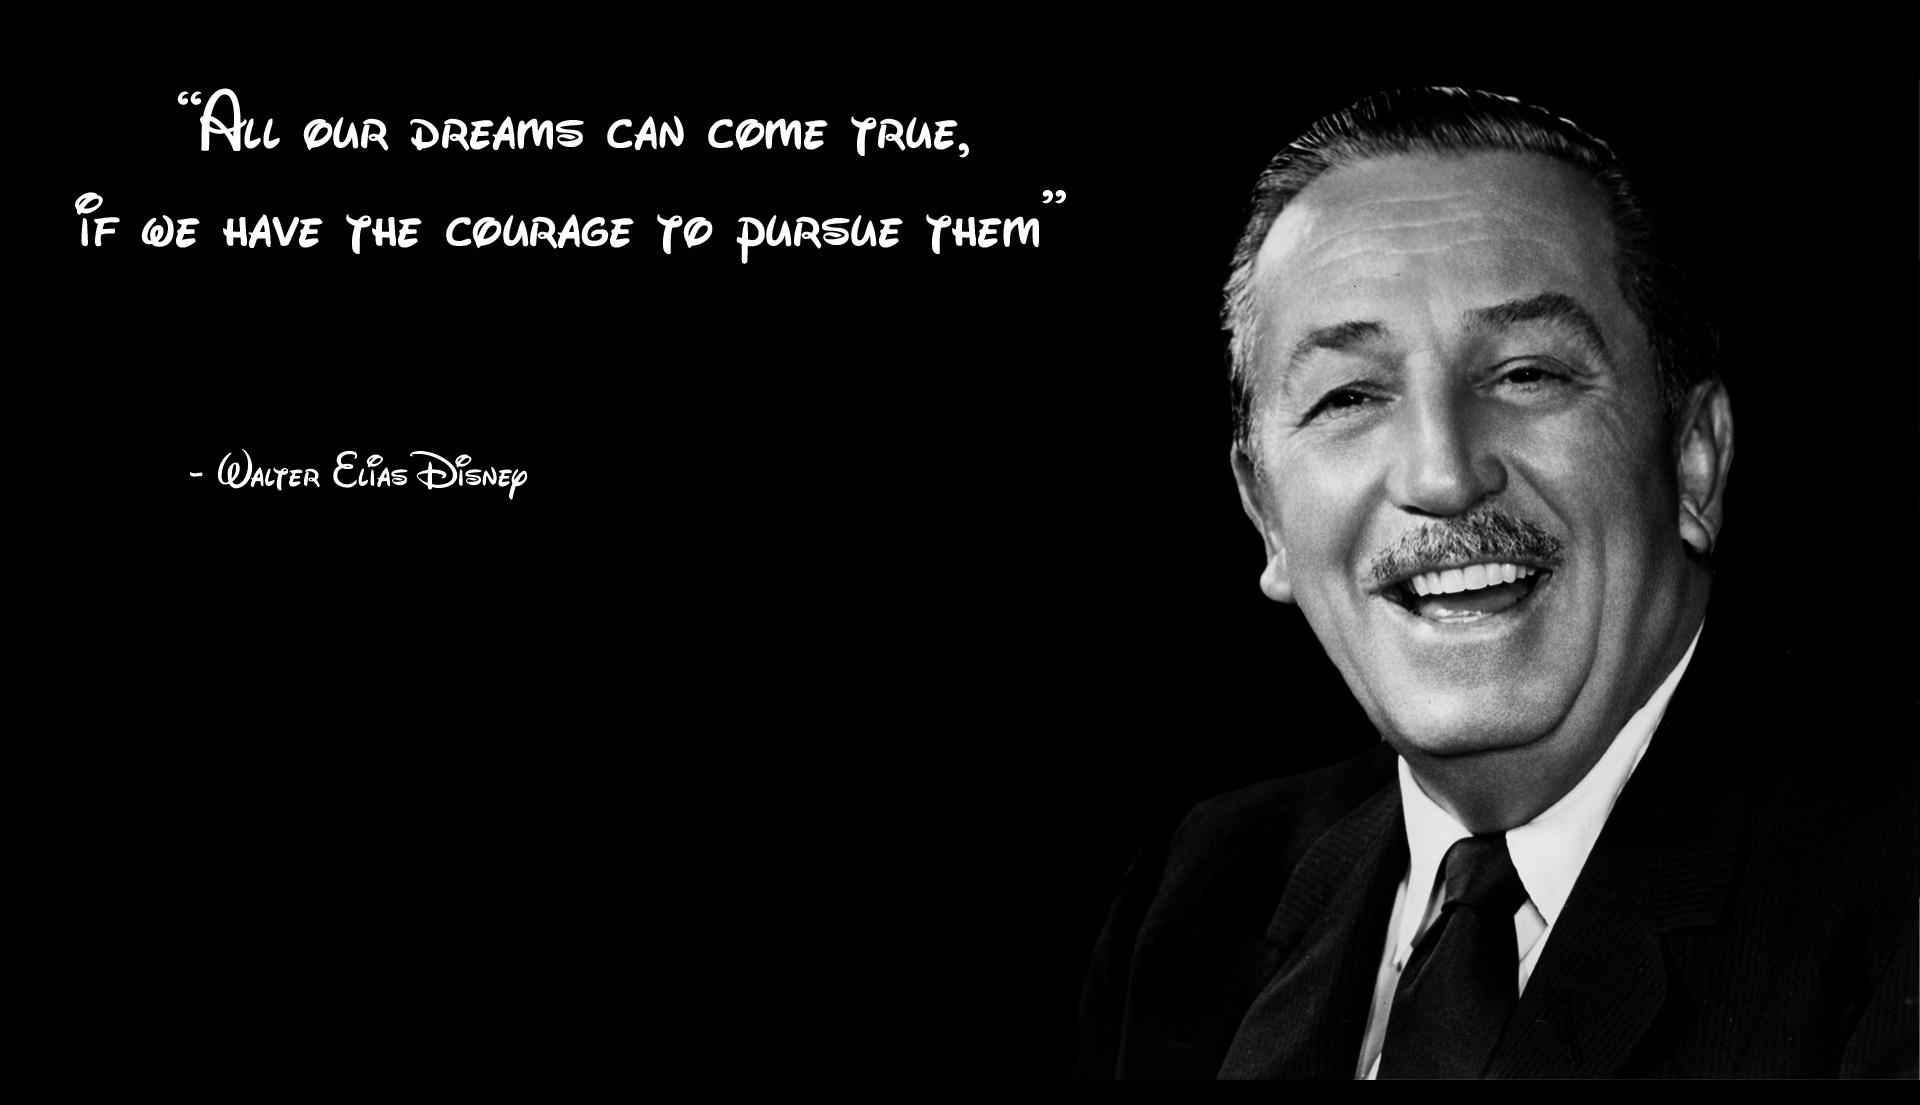 Walt Disney Quotes Wallpaper QuotesGram 1920x1105